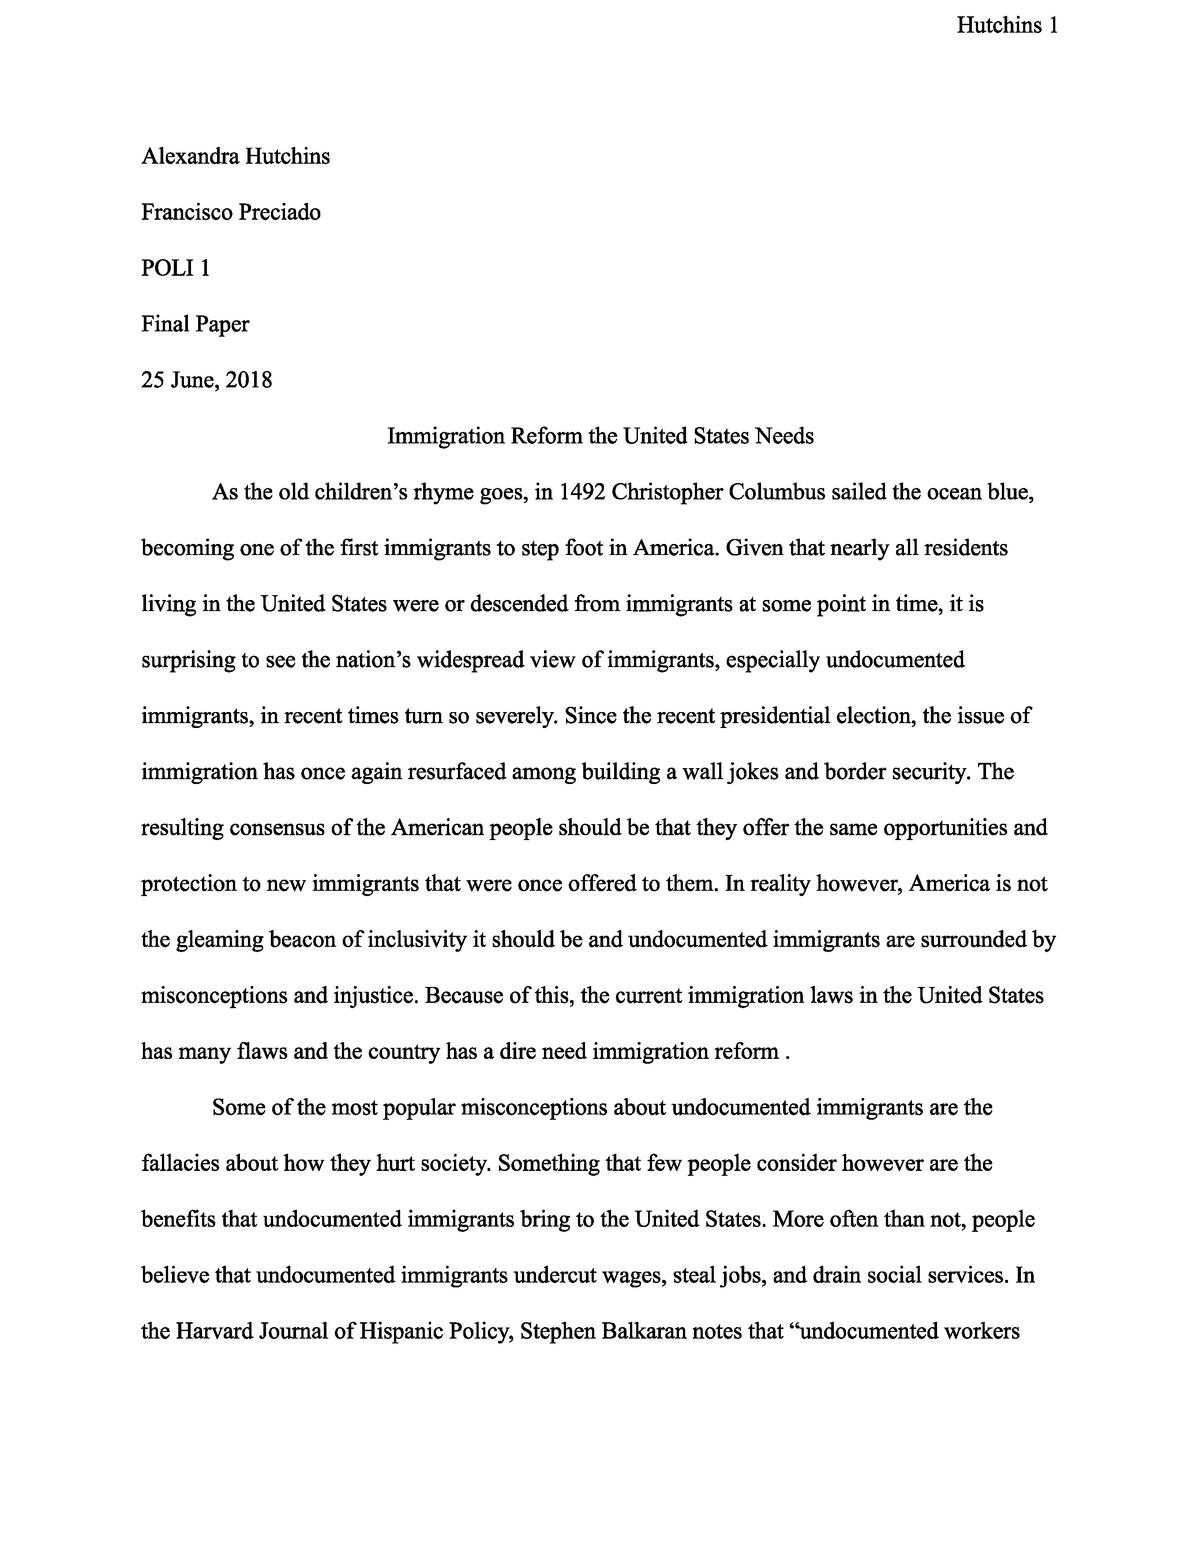 Immigration Reform Essay | Bartleby